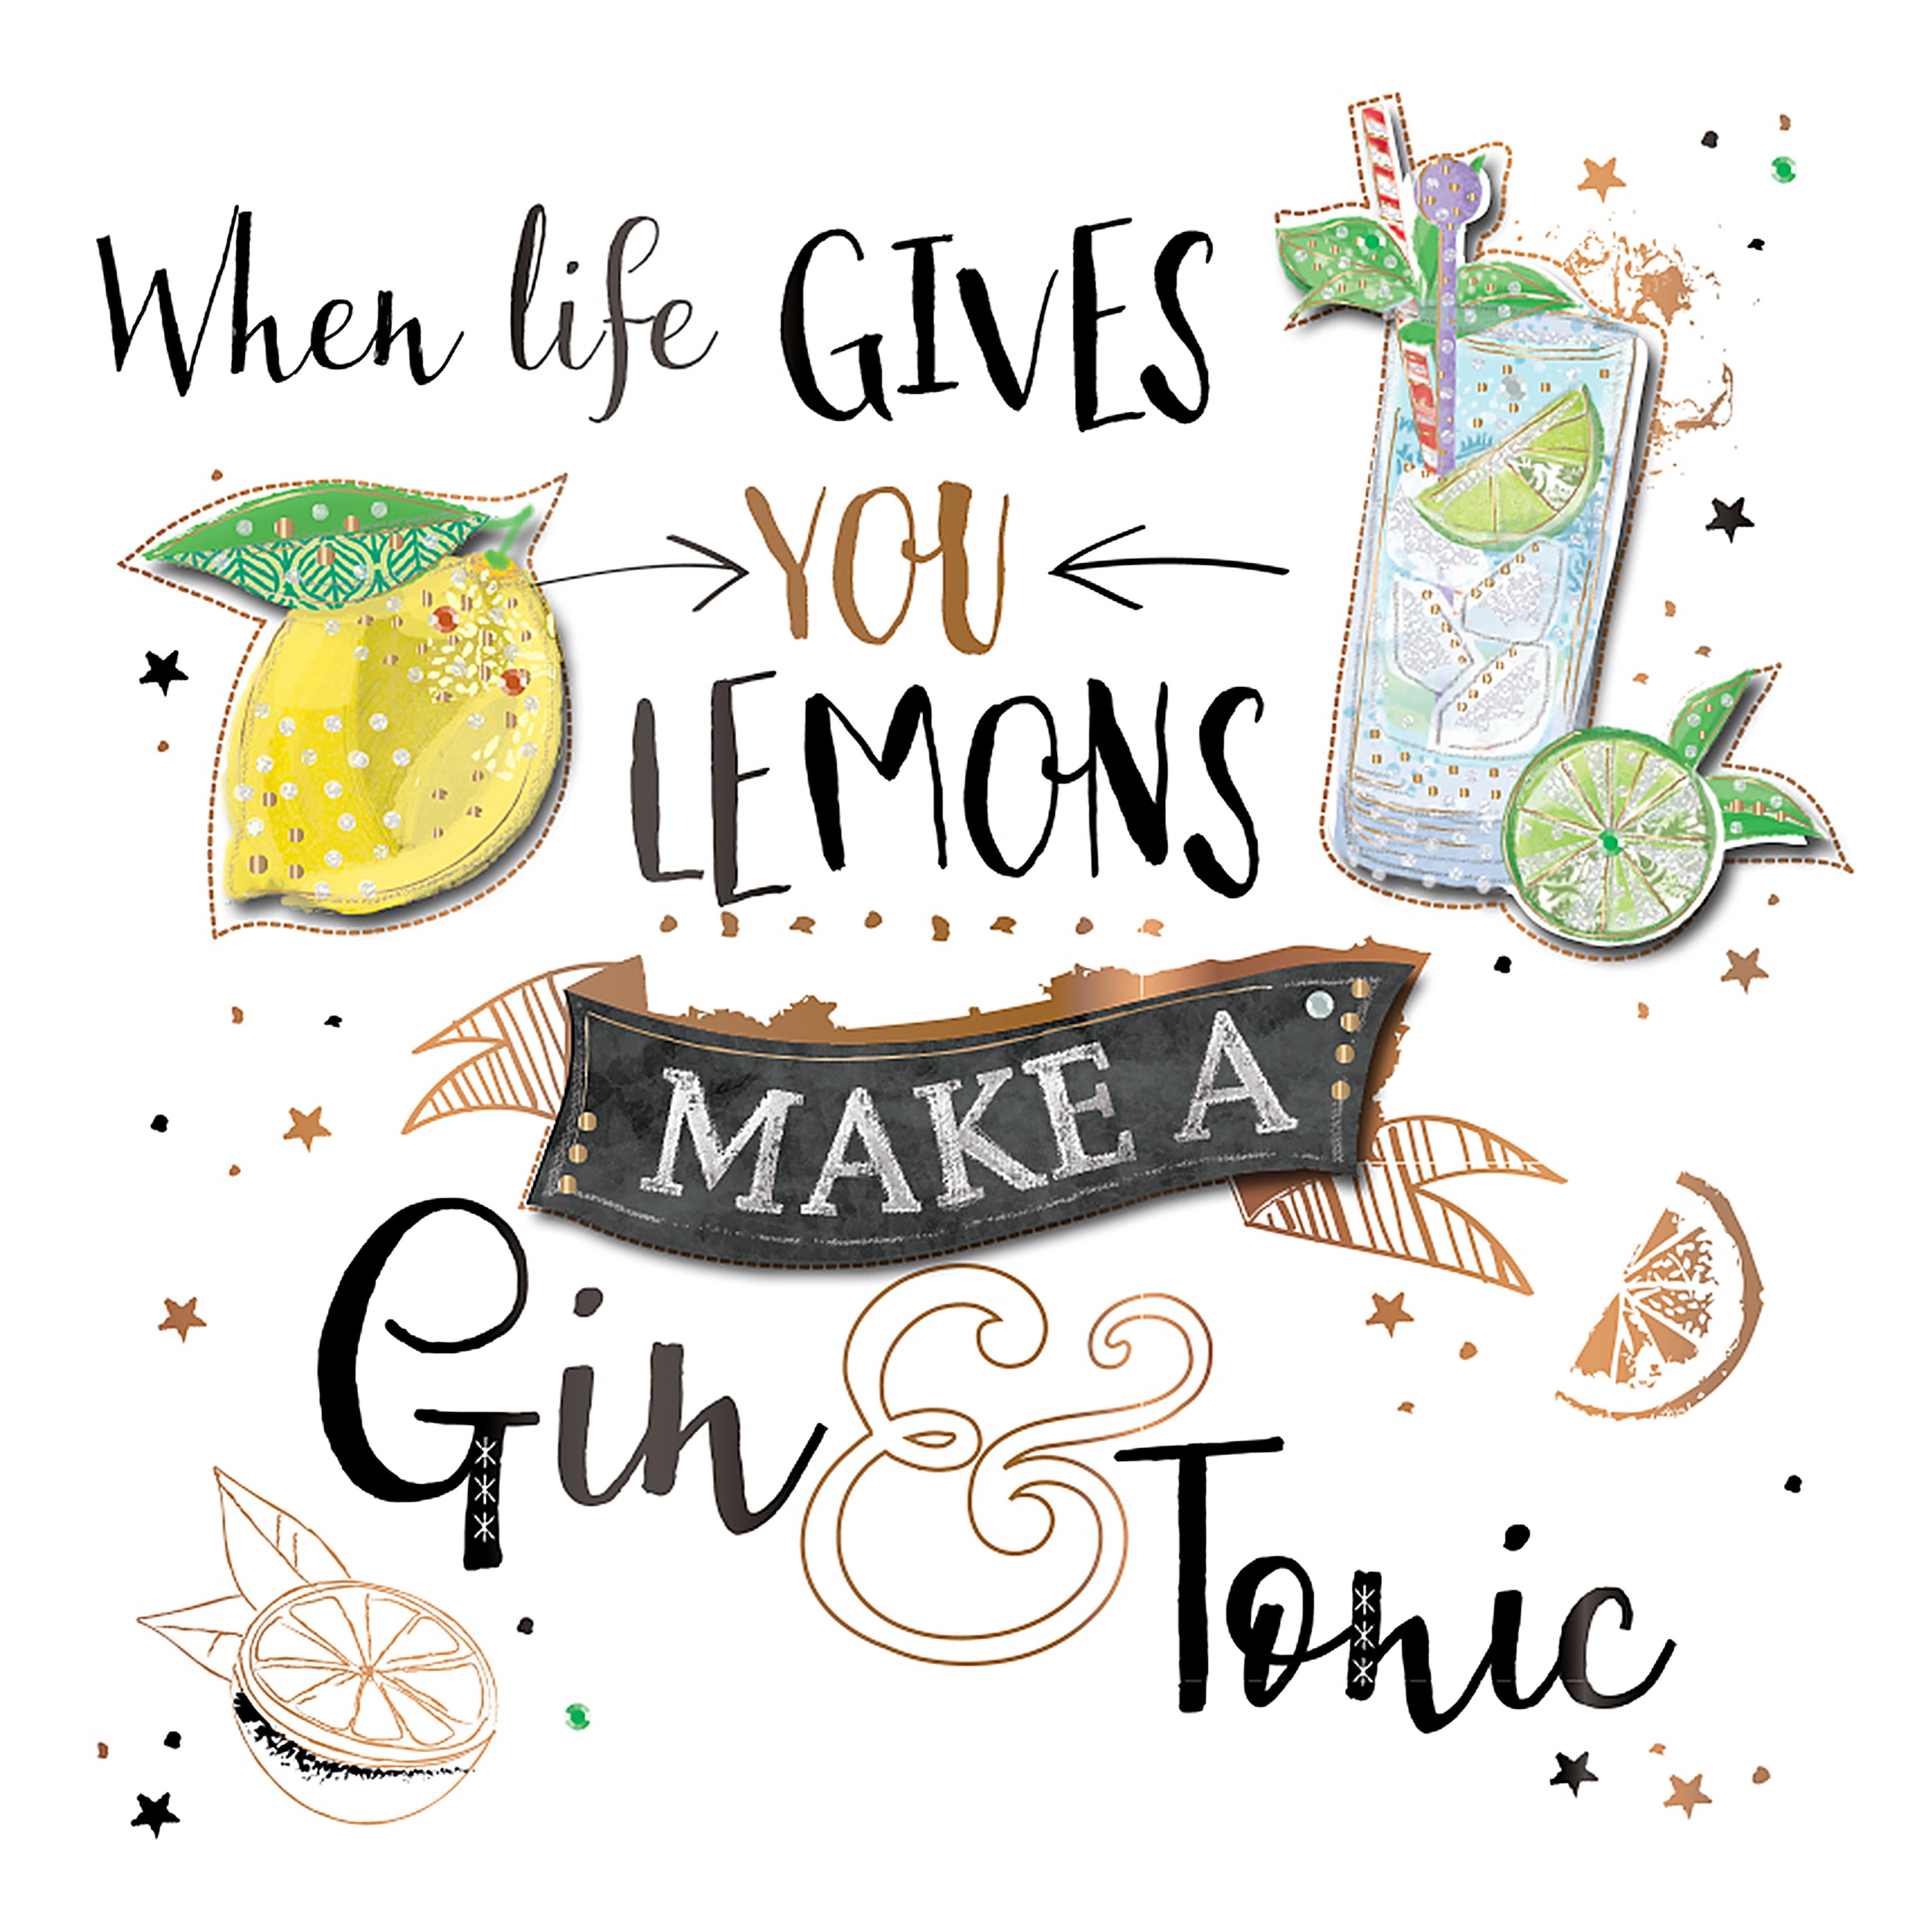 When life gives you lemons handmade greeting card cards love kates when life gives you lemons handmade greeting card m4hsunfo